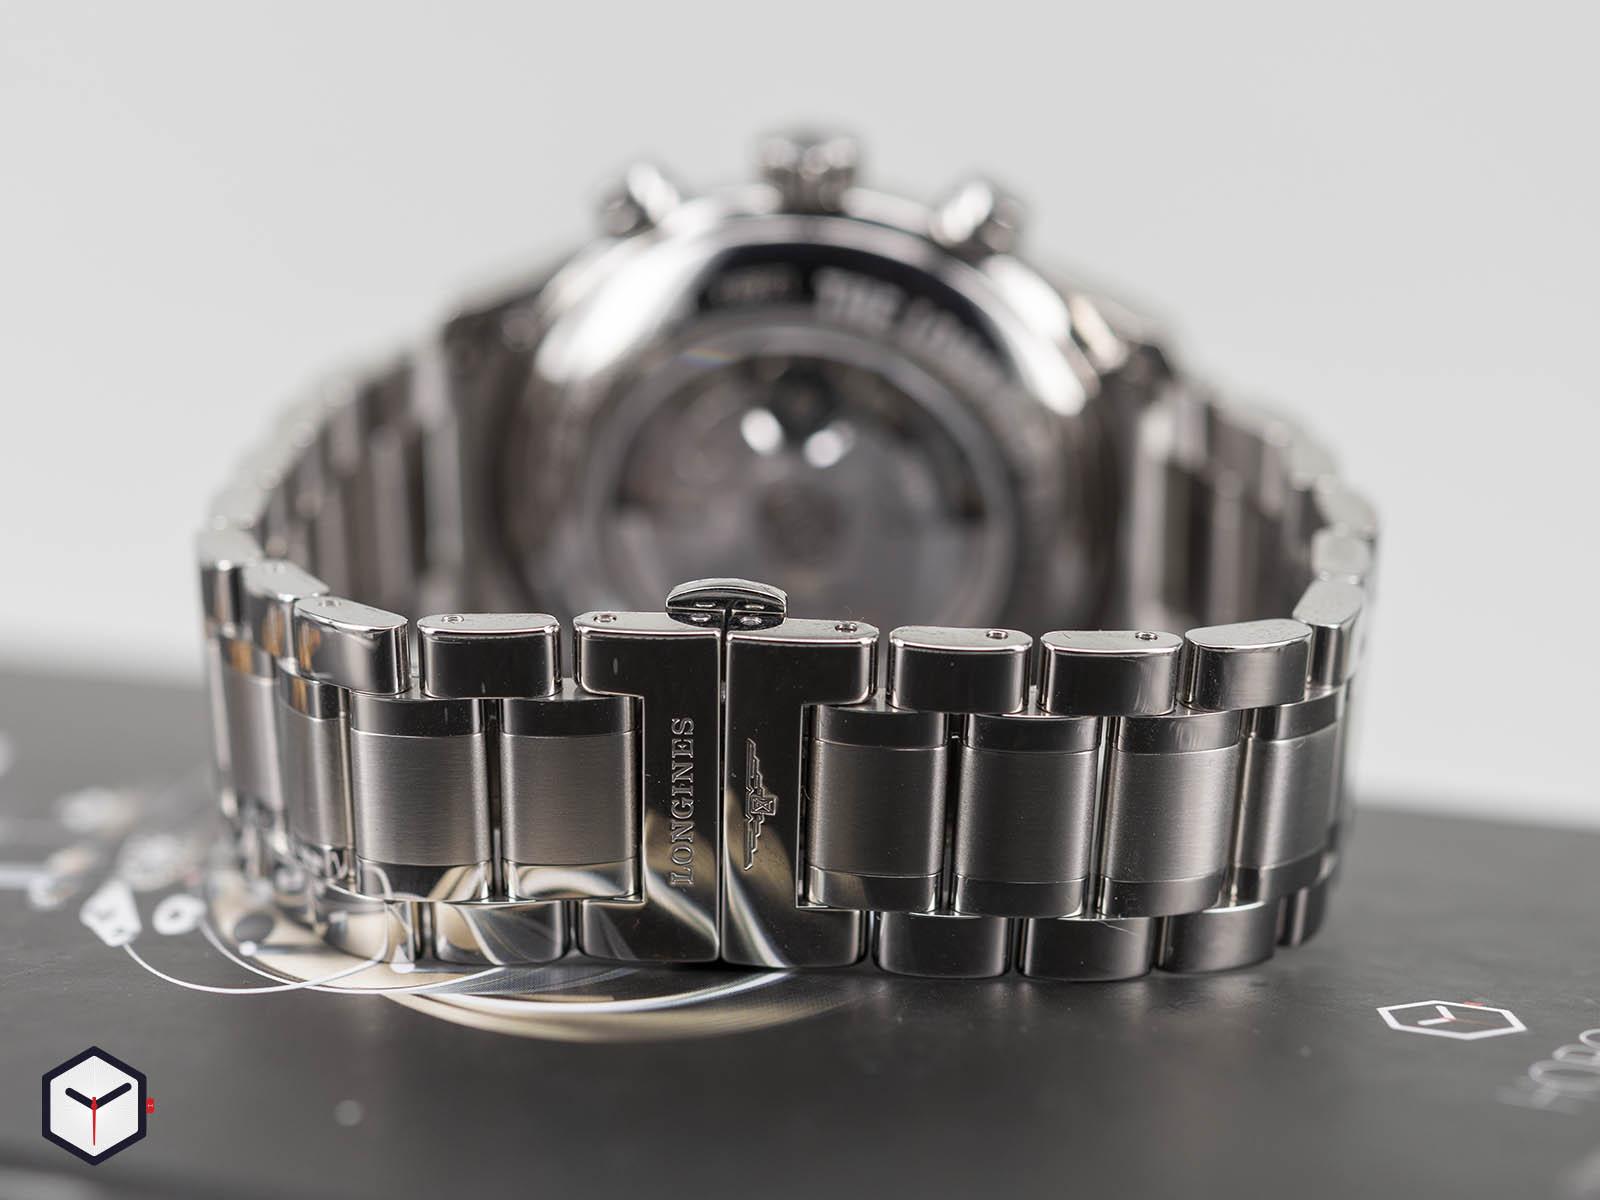 ll2-759-4-92-6-longines-master-collection-chronograph-7.jpg